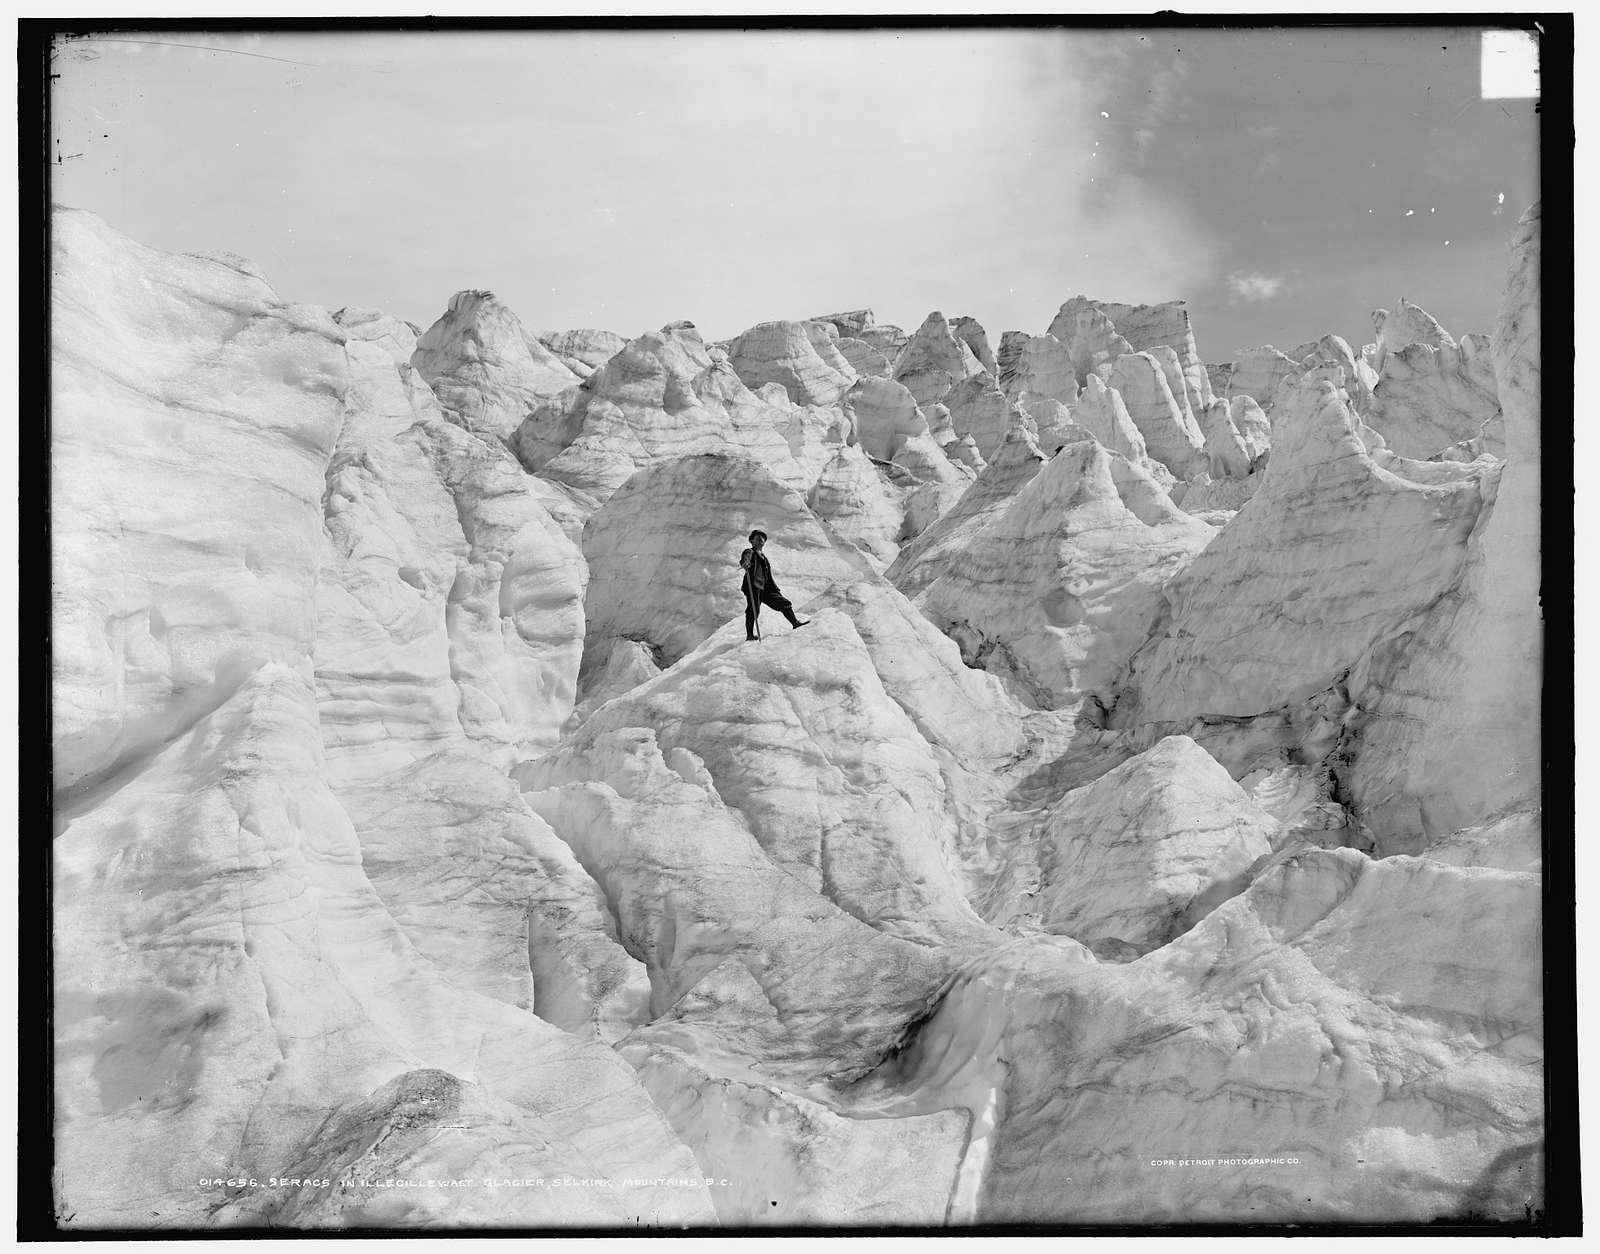 Seracs in Illecillewaet Glacier, Selkirk Mountains, B.C